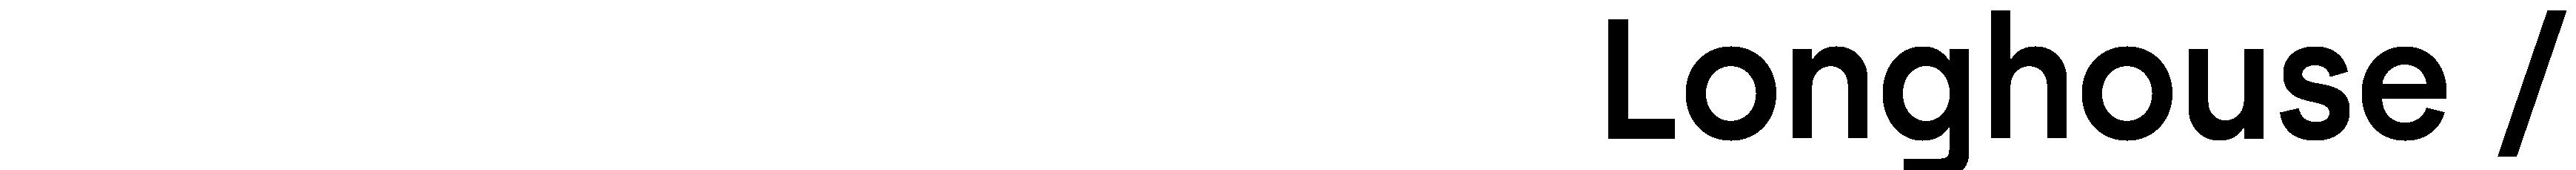 b2754b40-1e9f-11eb-9e13-912fc4d116a1.png